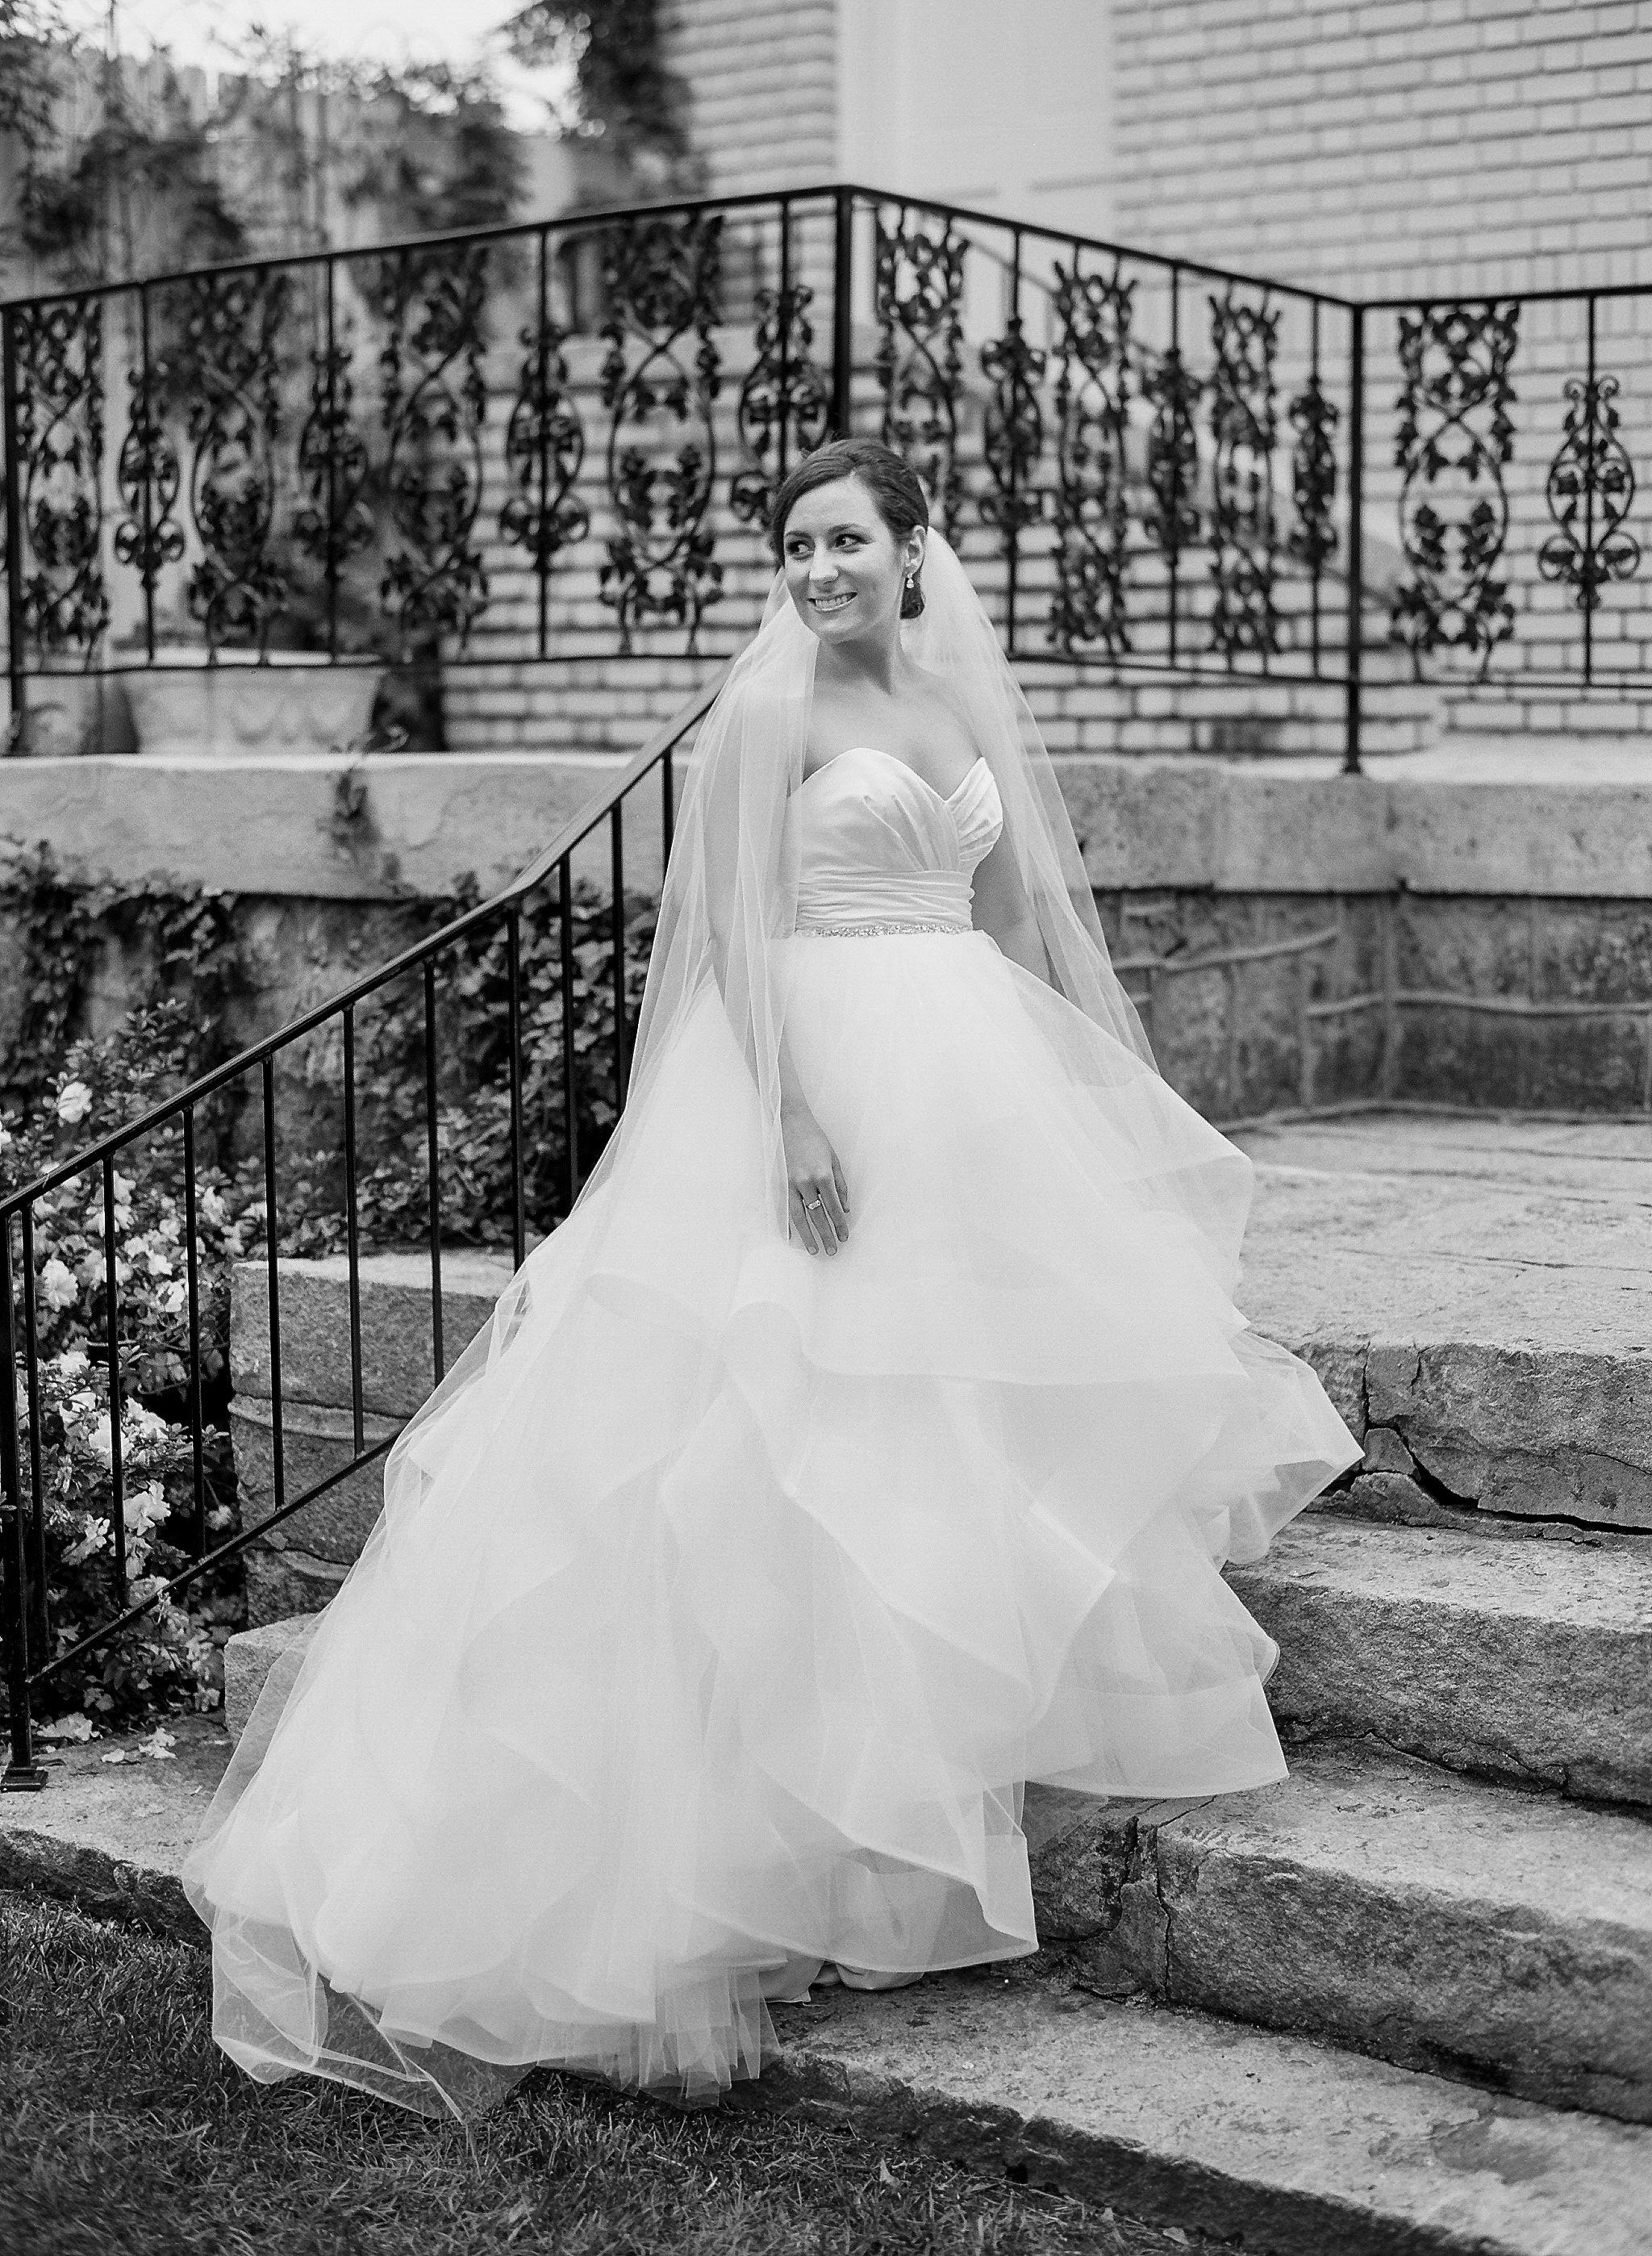 North-Carolina-Bridal-Photographer-Rebecca-6.jpg